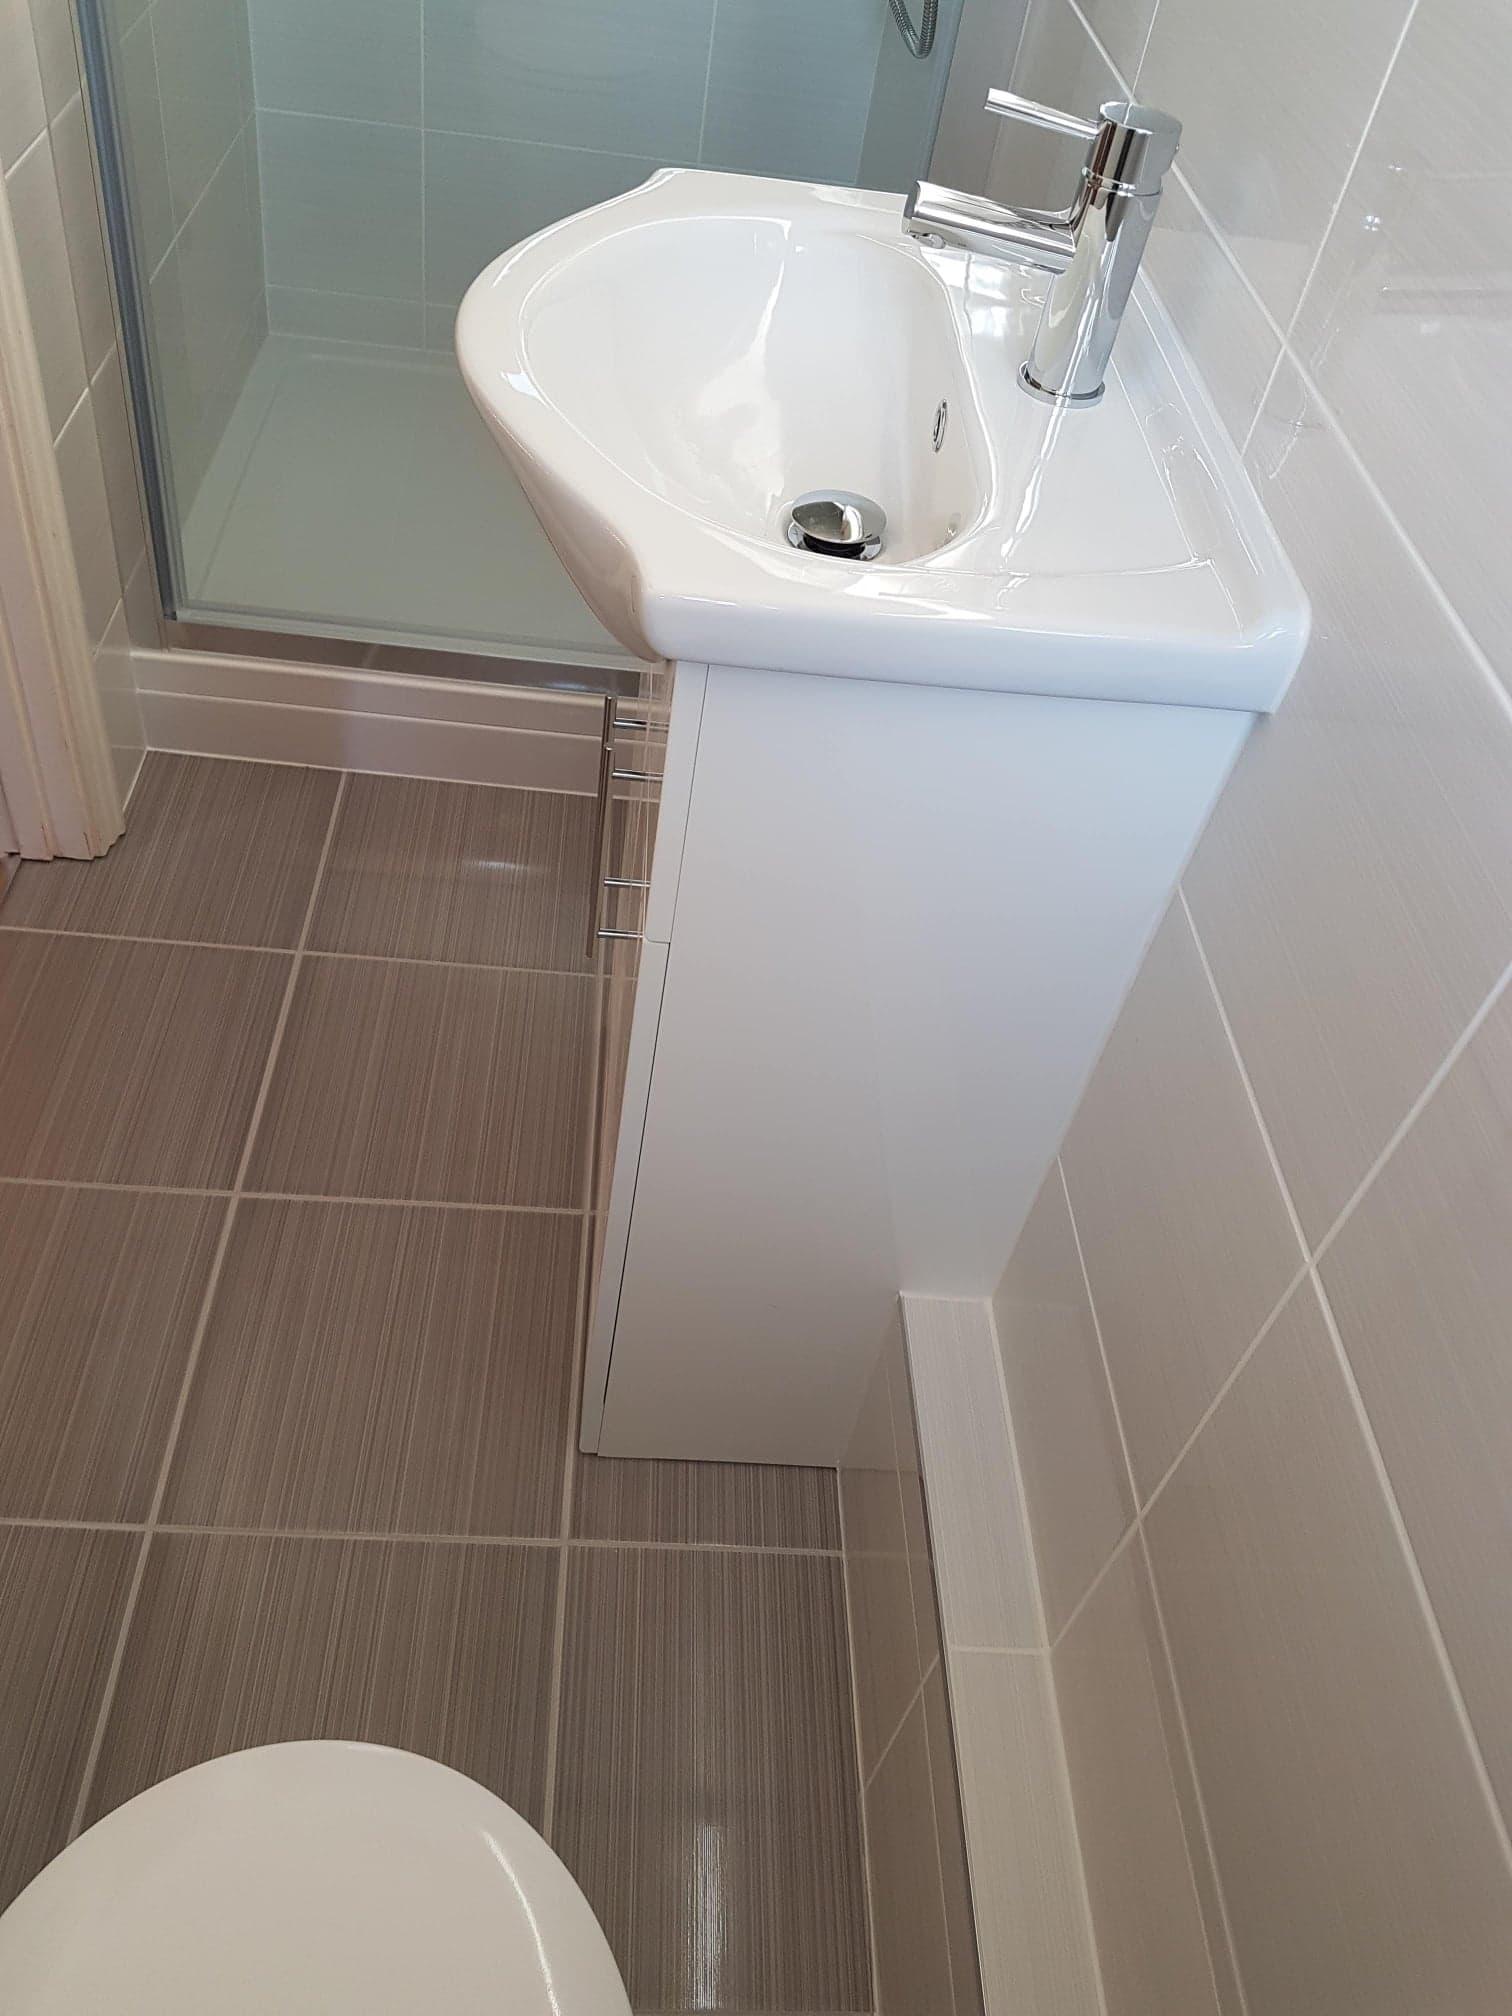 bathroom-sink-east-sussex-installation